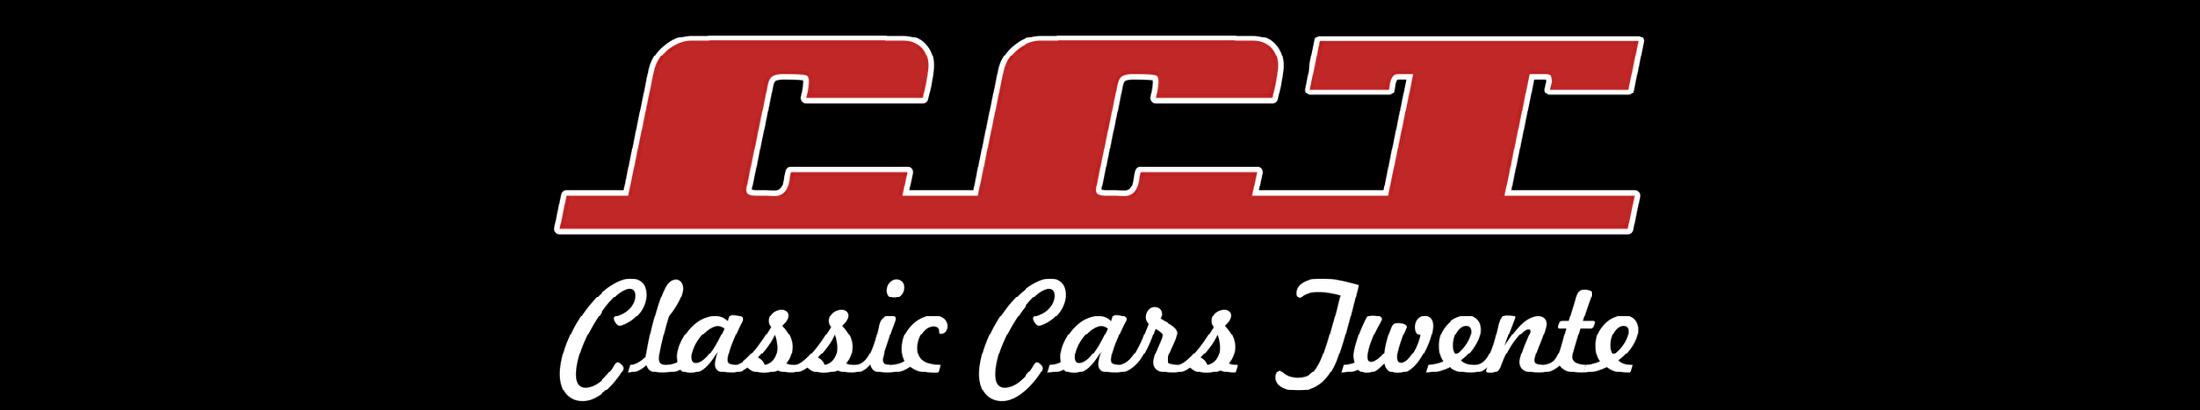 Clasic car header